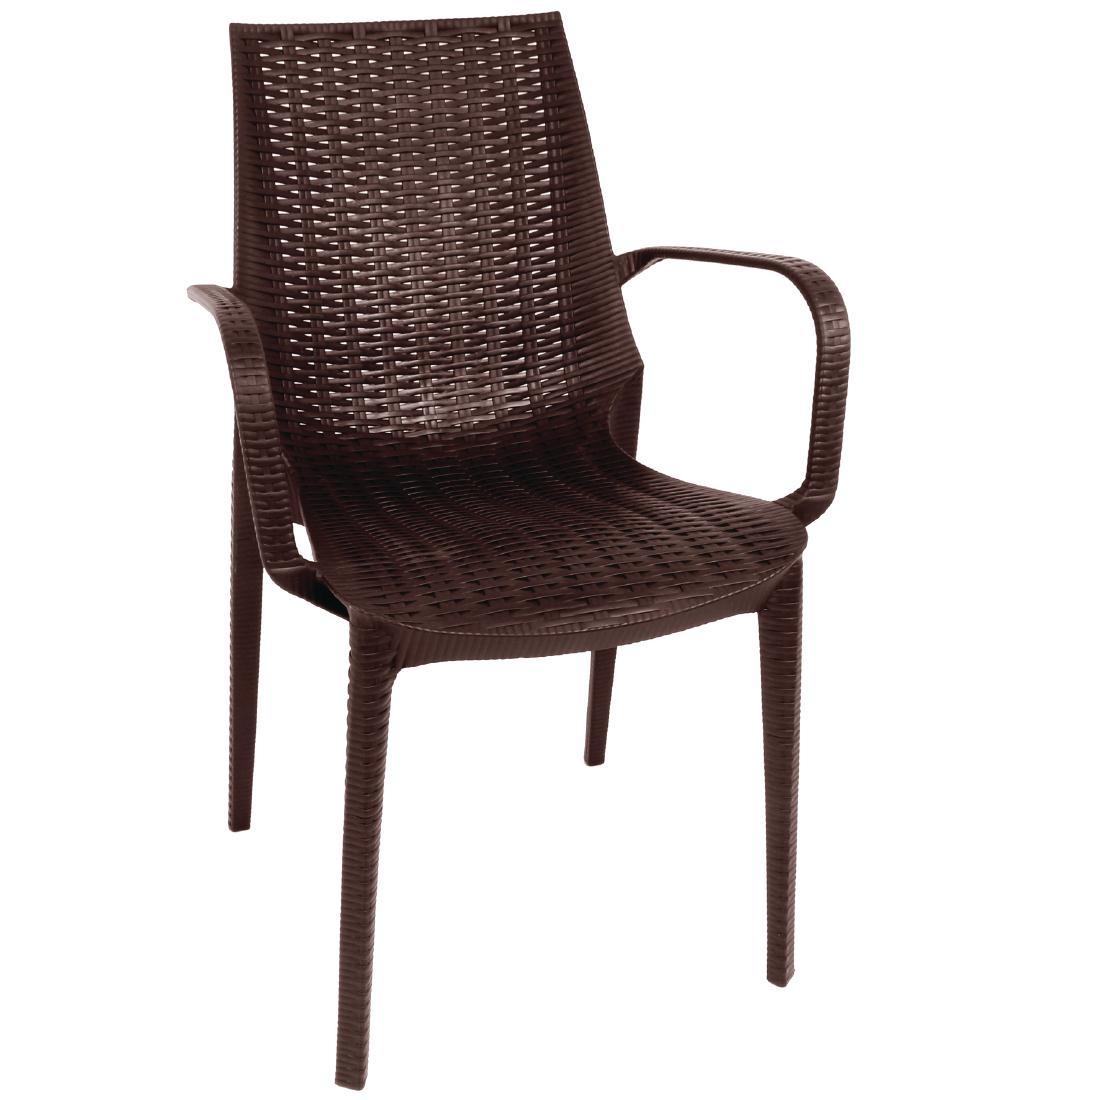 outdoor stuhl krista 190st a braun g nstig kaufen m bel star. Black Bedroom Furniture Sets. Home Design Ideas